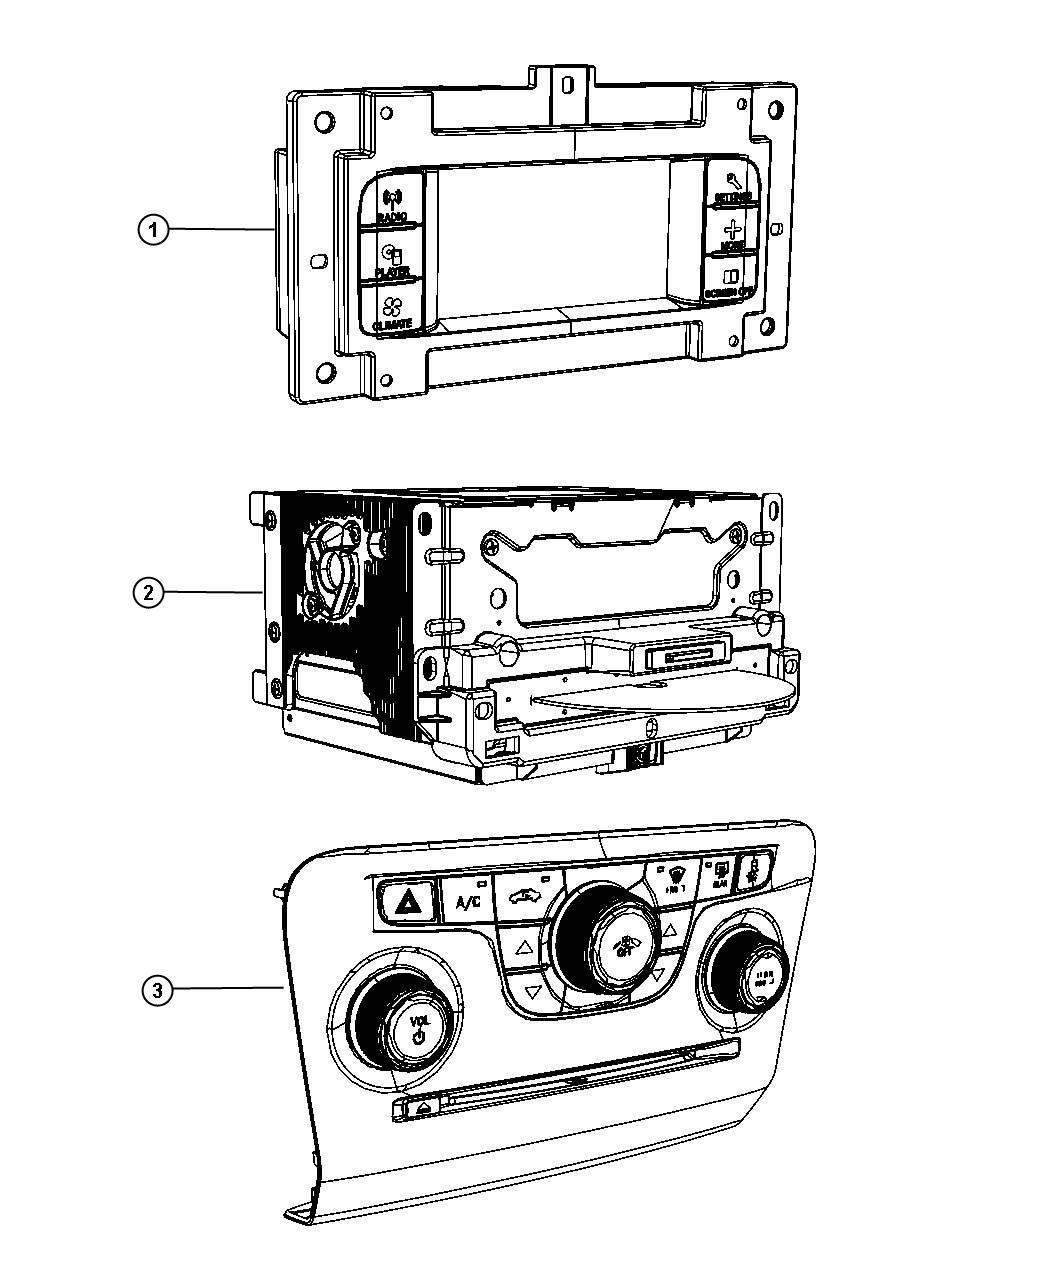 2012 Chrysler 300 Radio. Multi media. [radio 8.4 nav